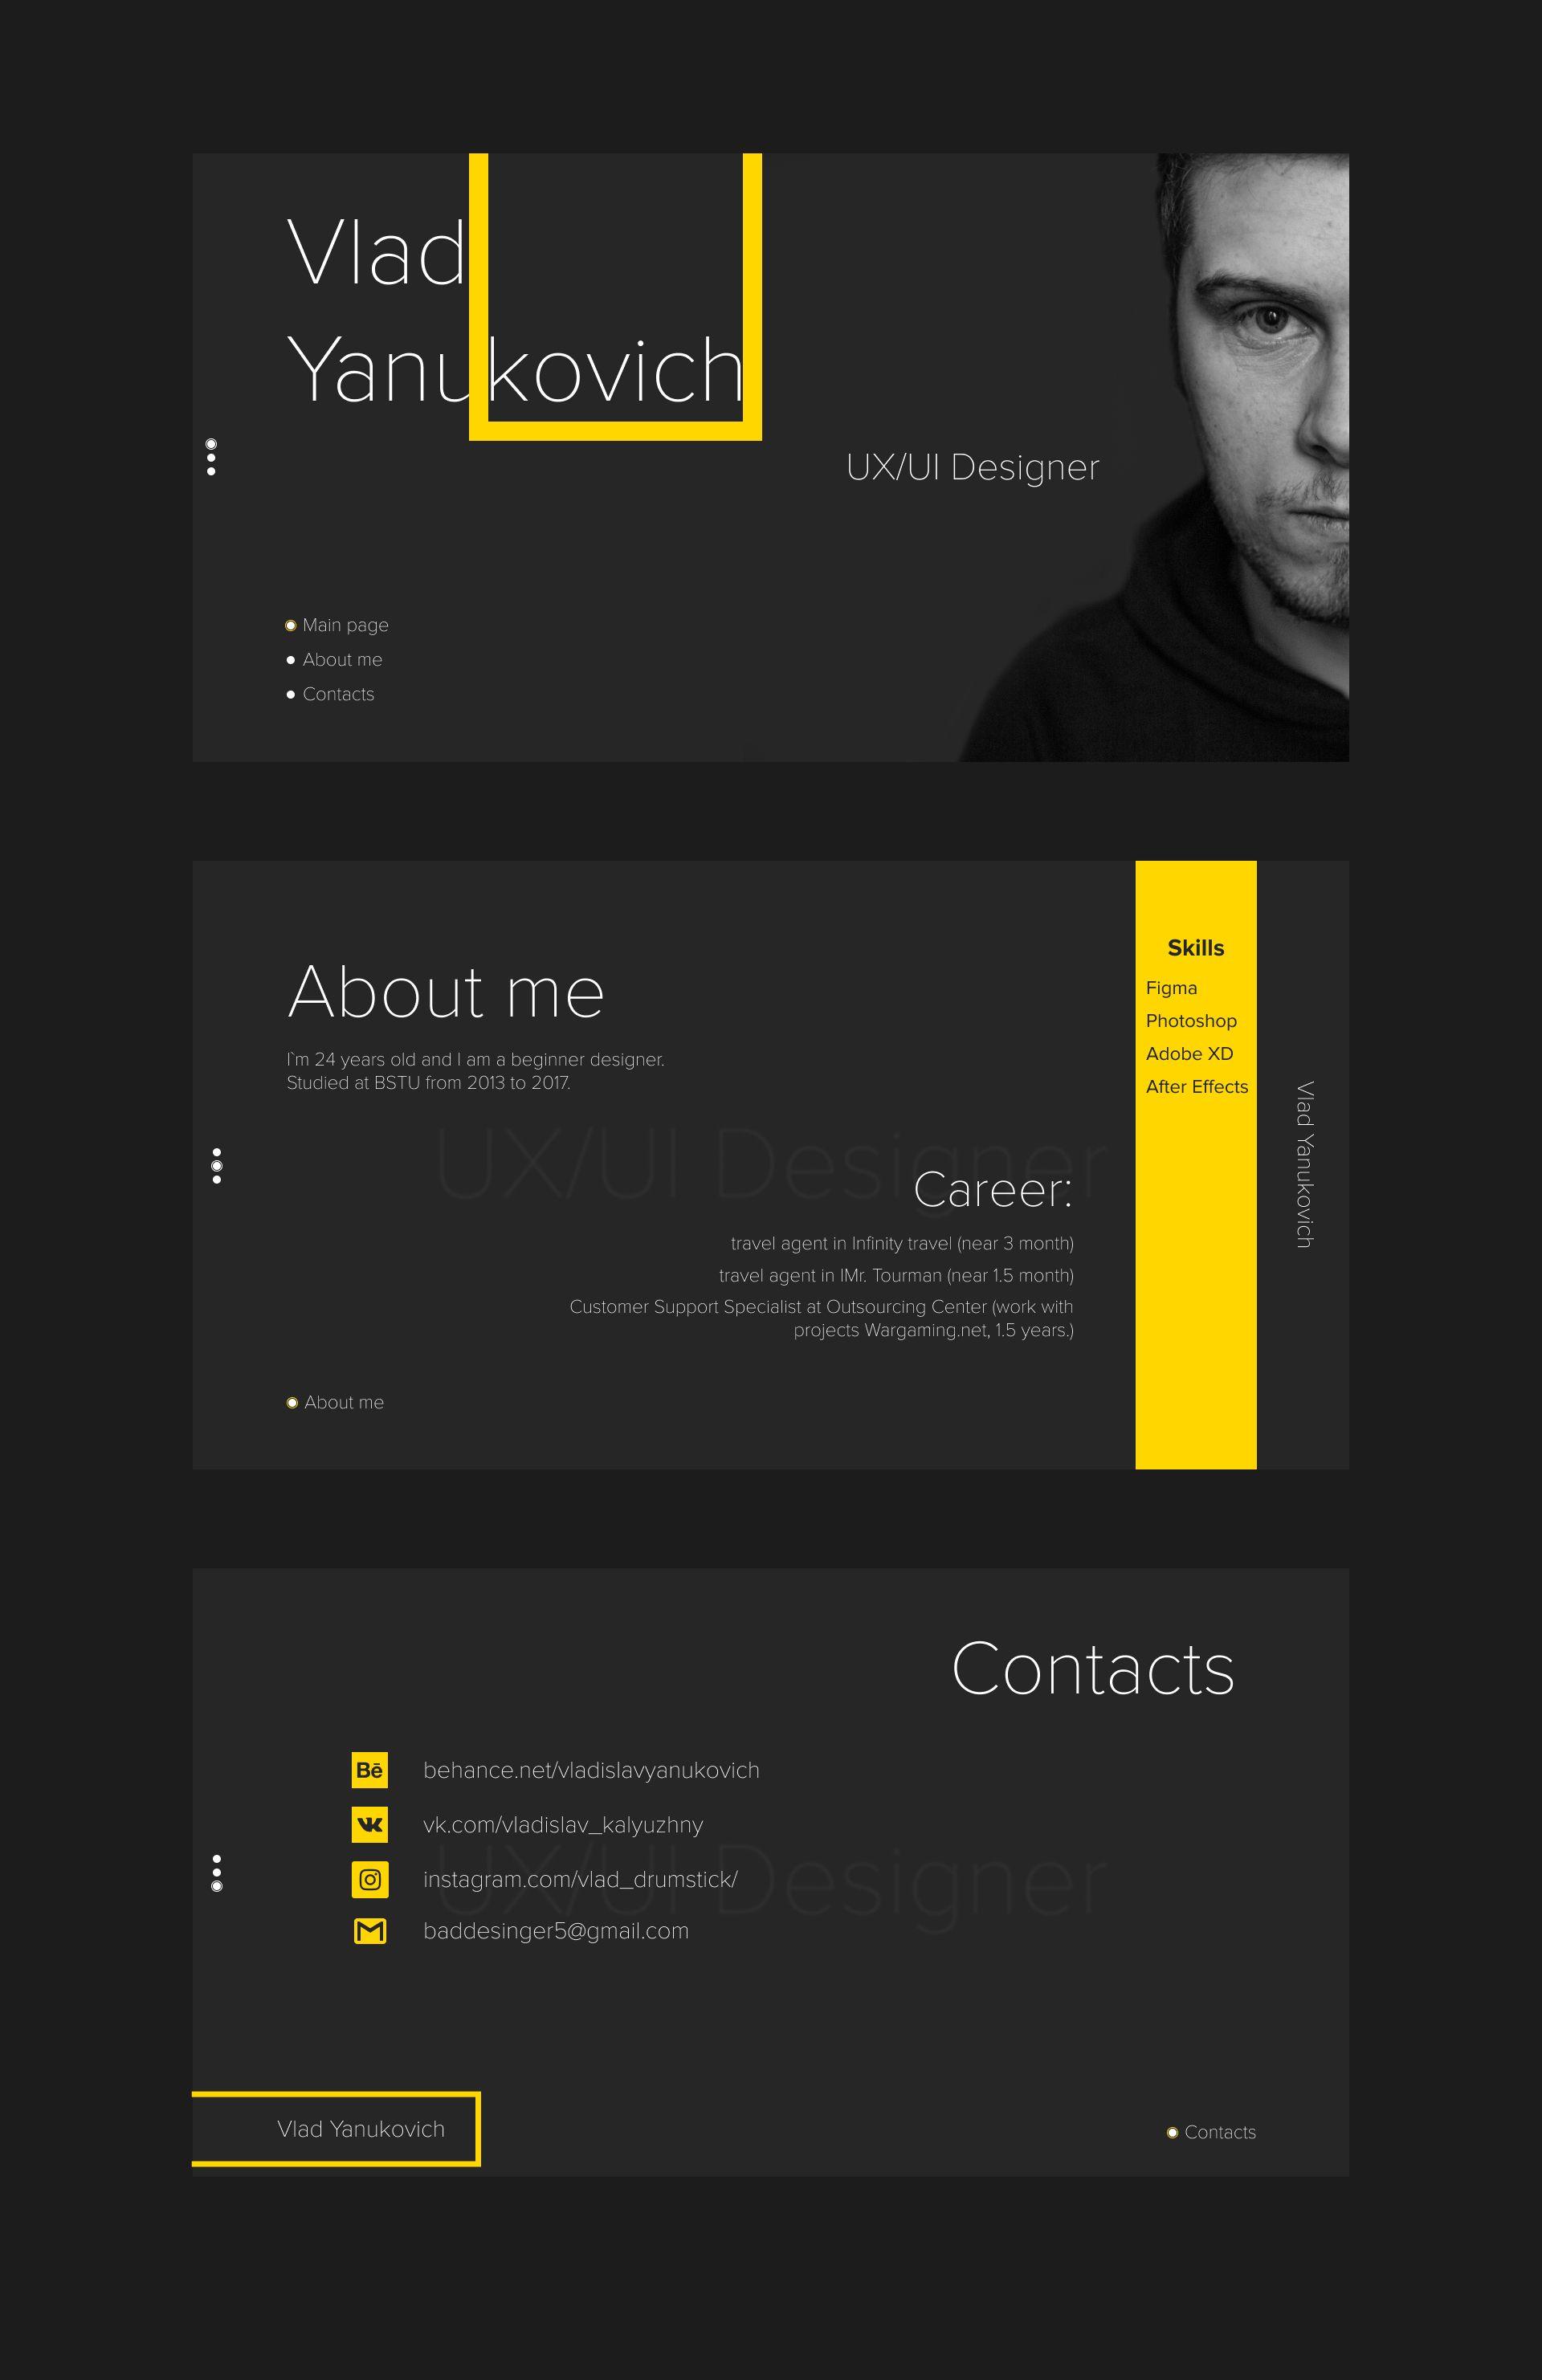 25+ Adobe xd resume template Resume Examples